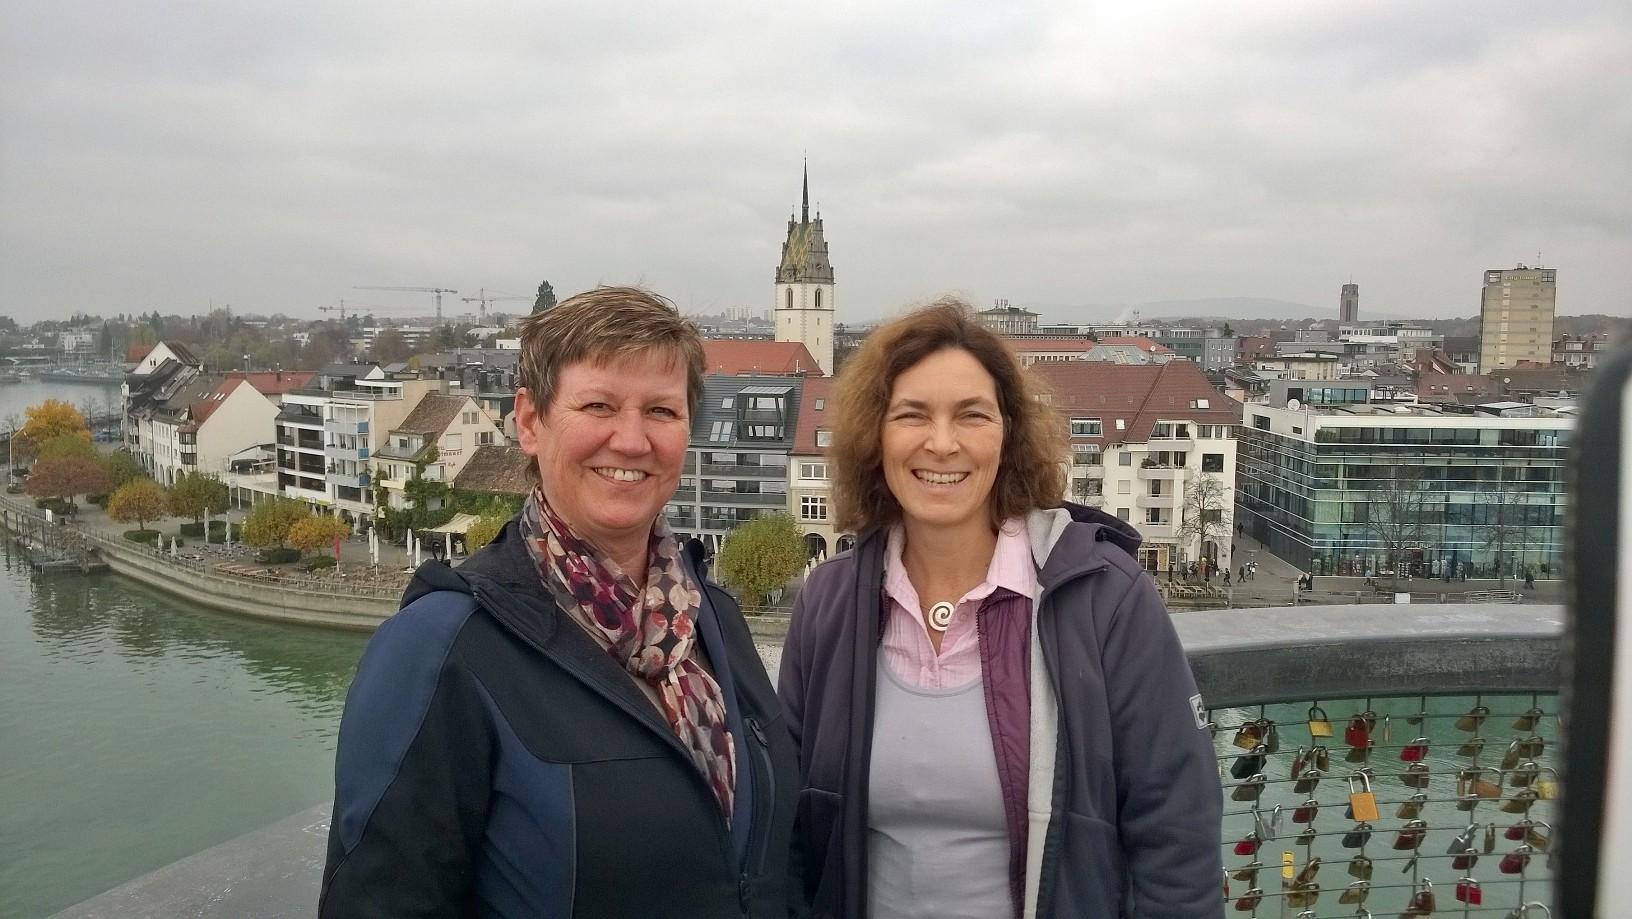 Auf dem Bild mit Bärbel Imhof, Bezirksrätin aus MainSpessart.